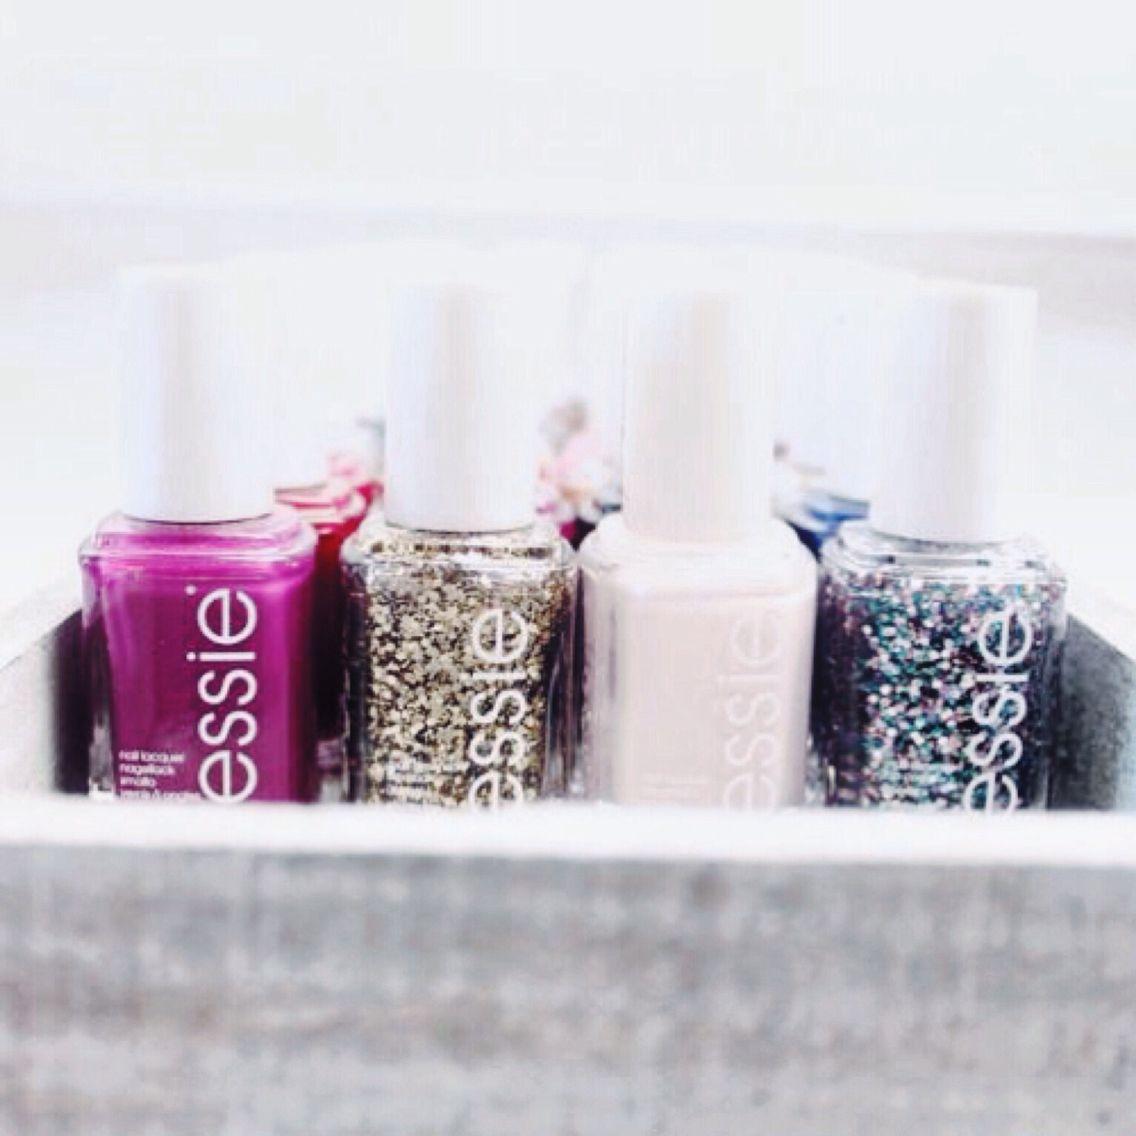 Pin by Nessa on Nails | Pinterest | Nail care, Nail set and Color nails